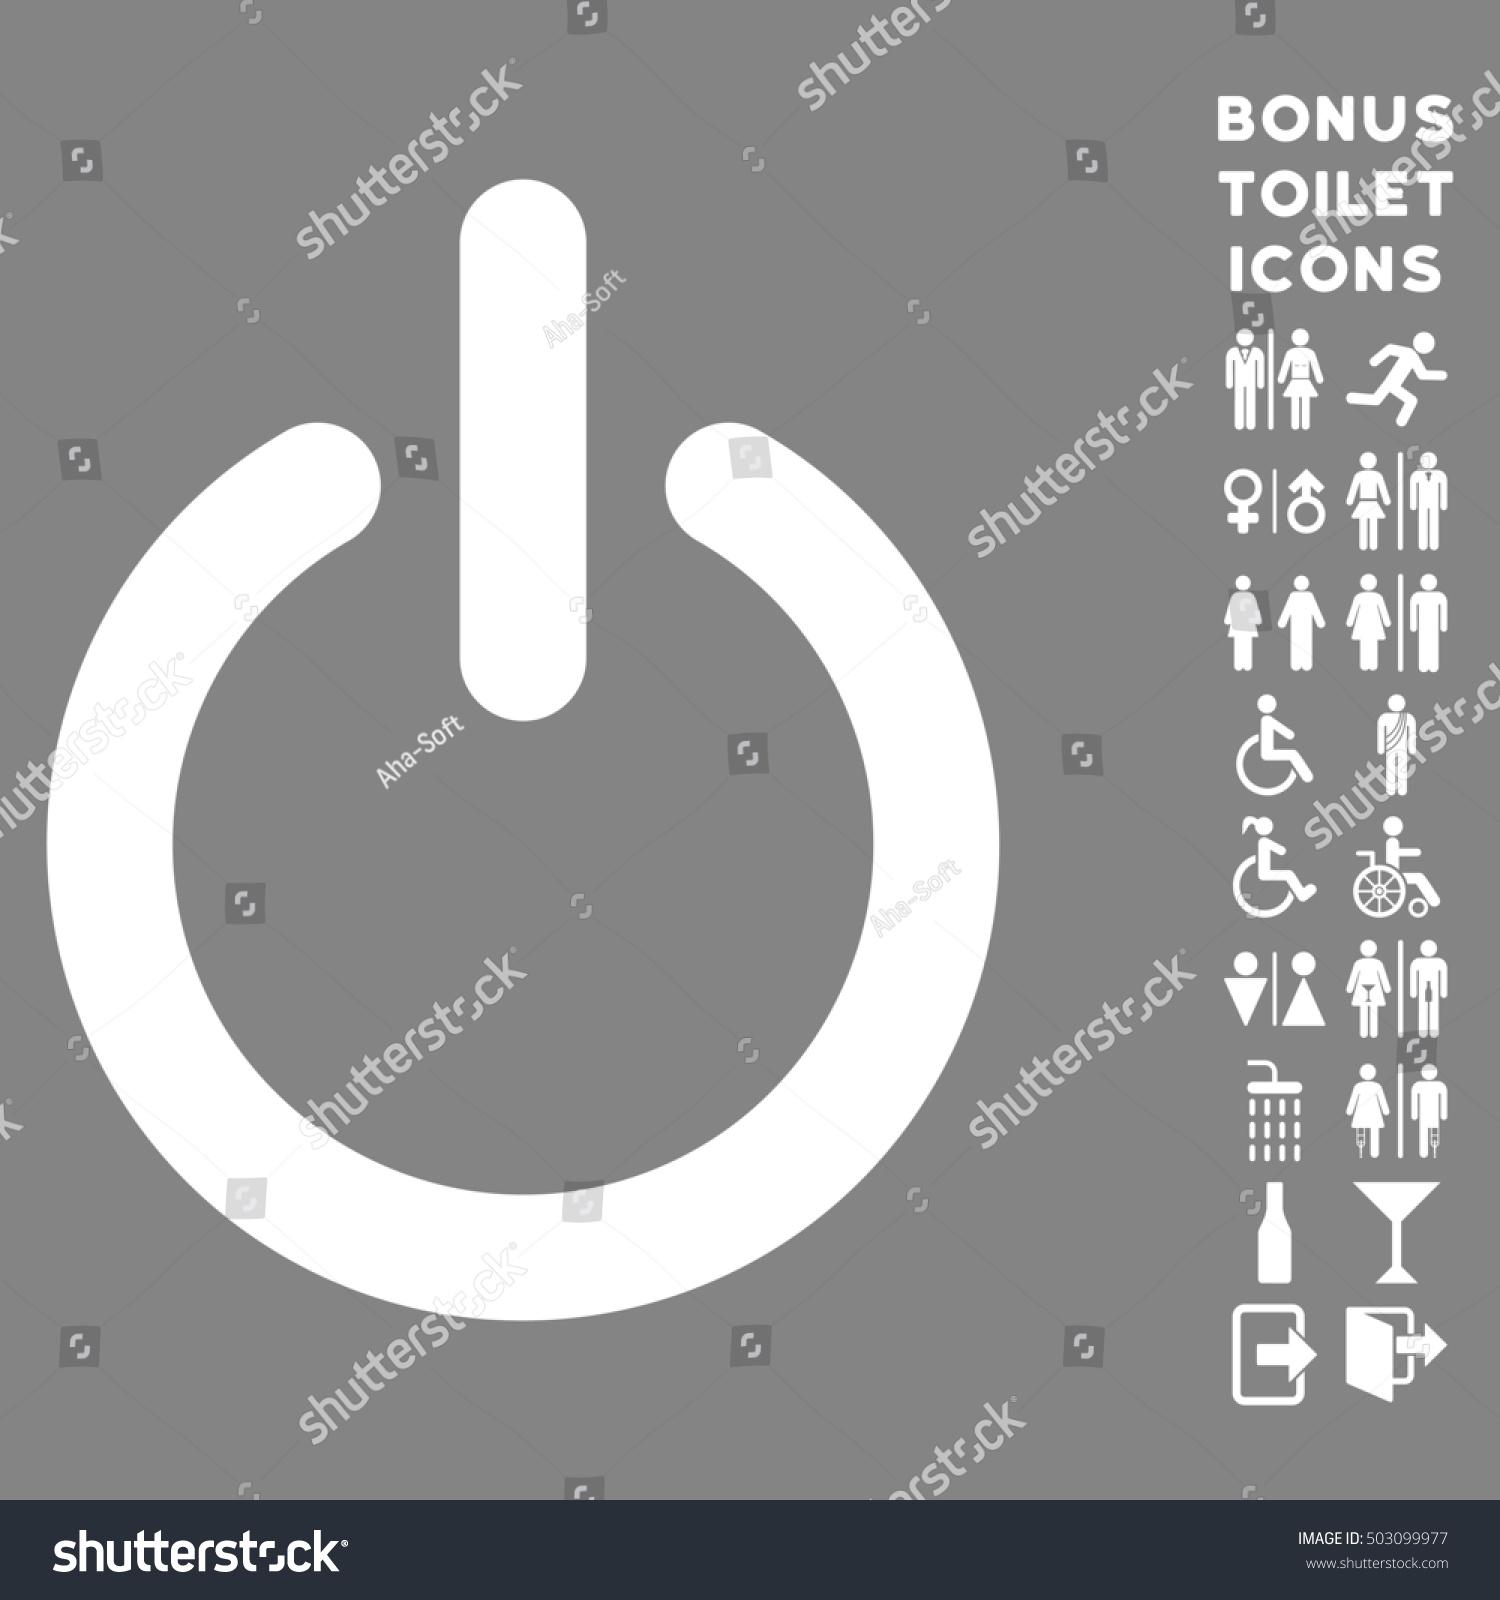 Turn Off Icon Bonus Man Lady Stock Illustration 503099977 - Shutterstock